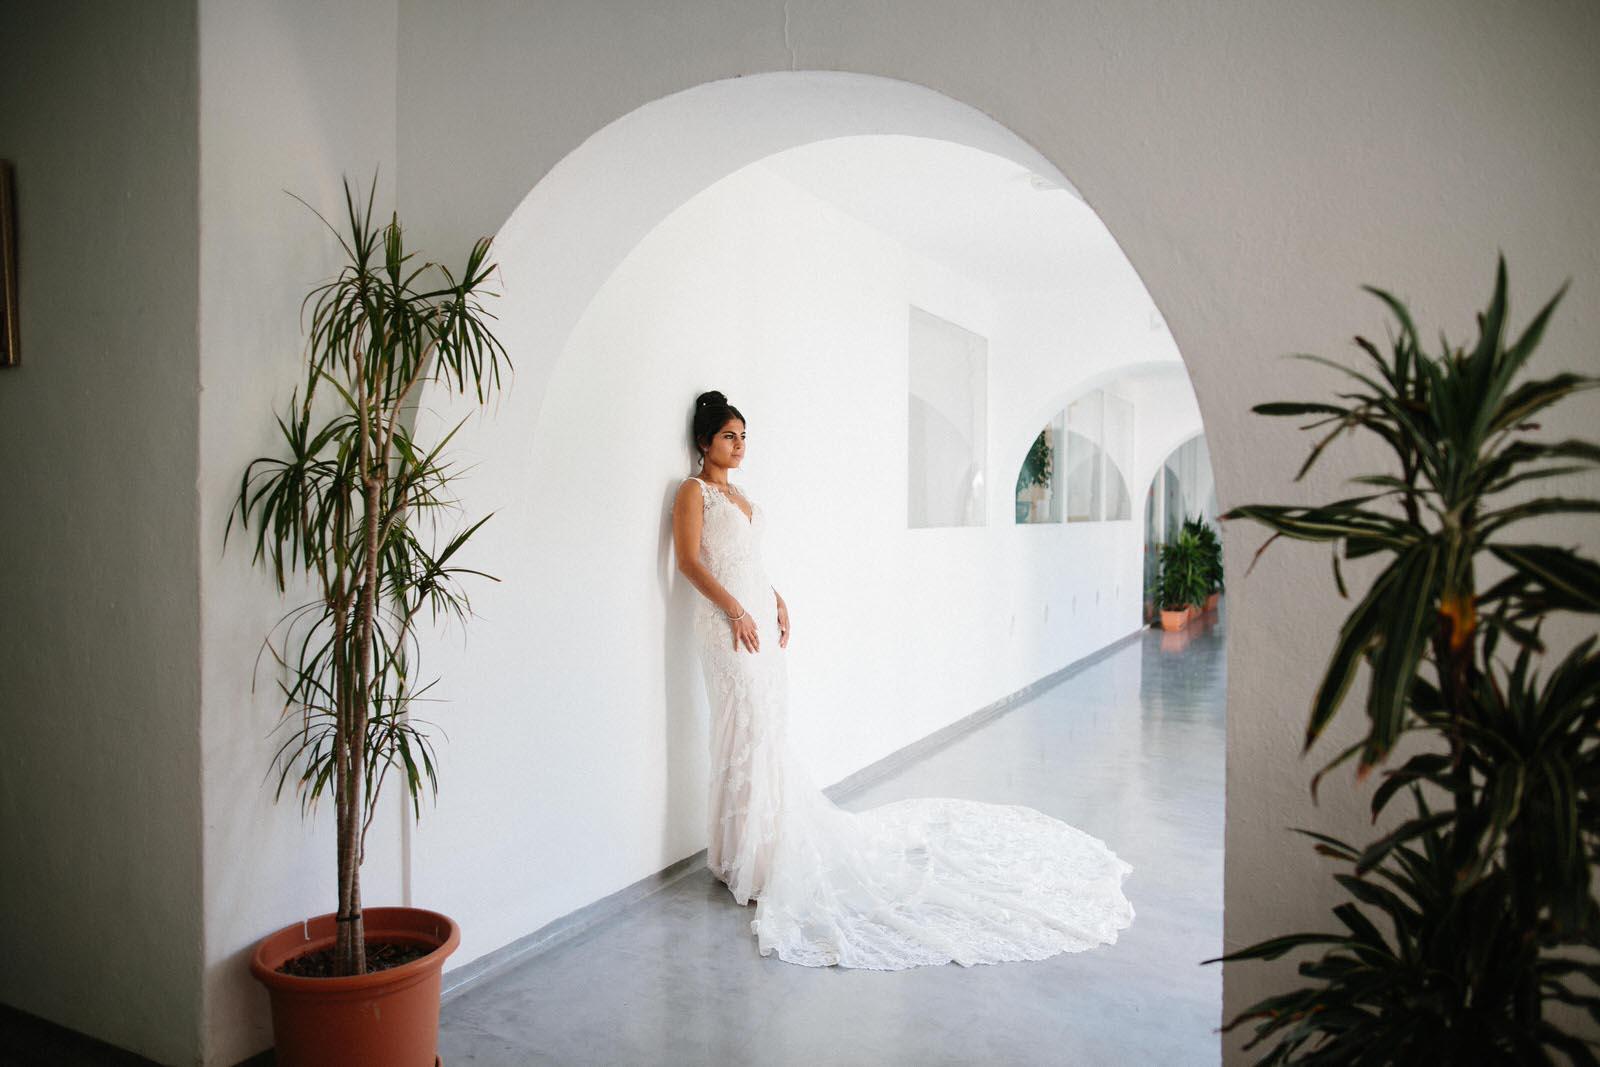 ibiza+wedding+photographer-39.jpg